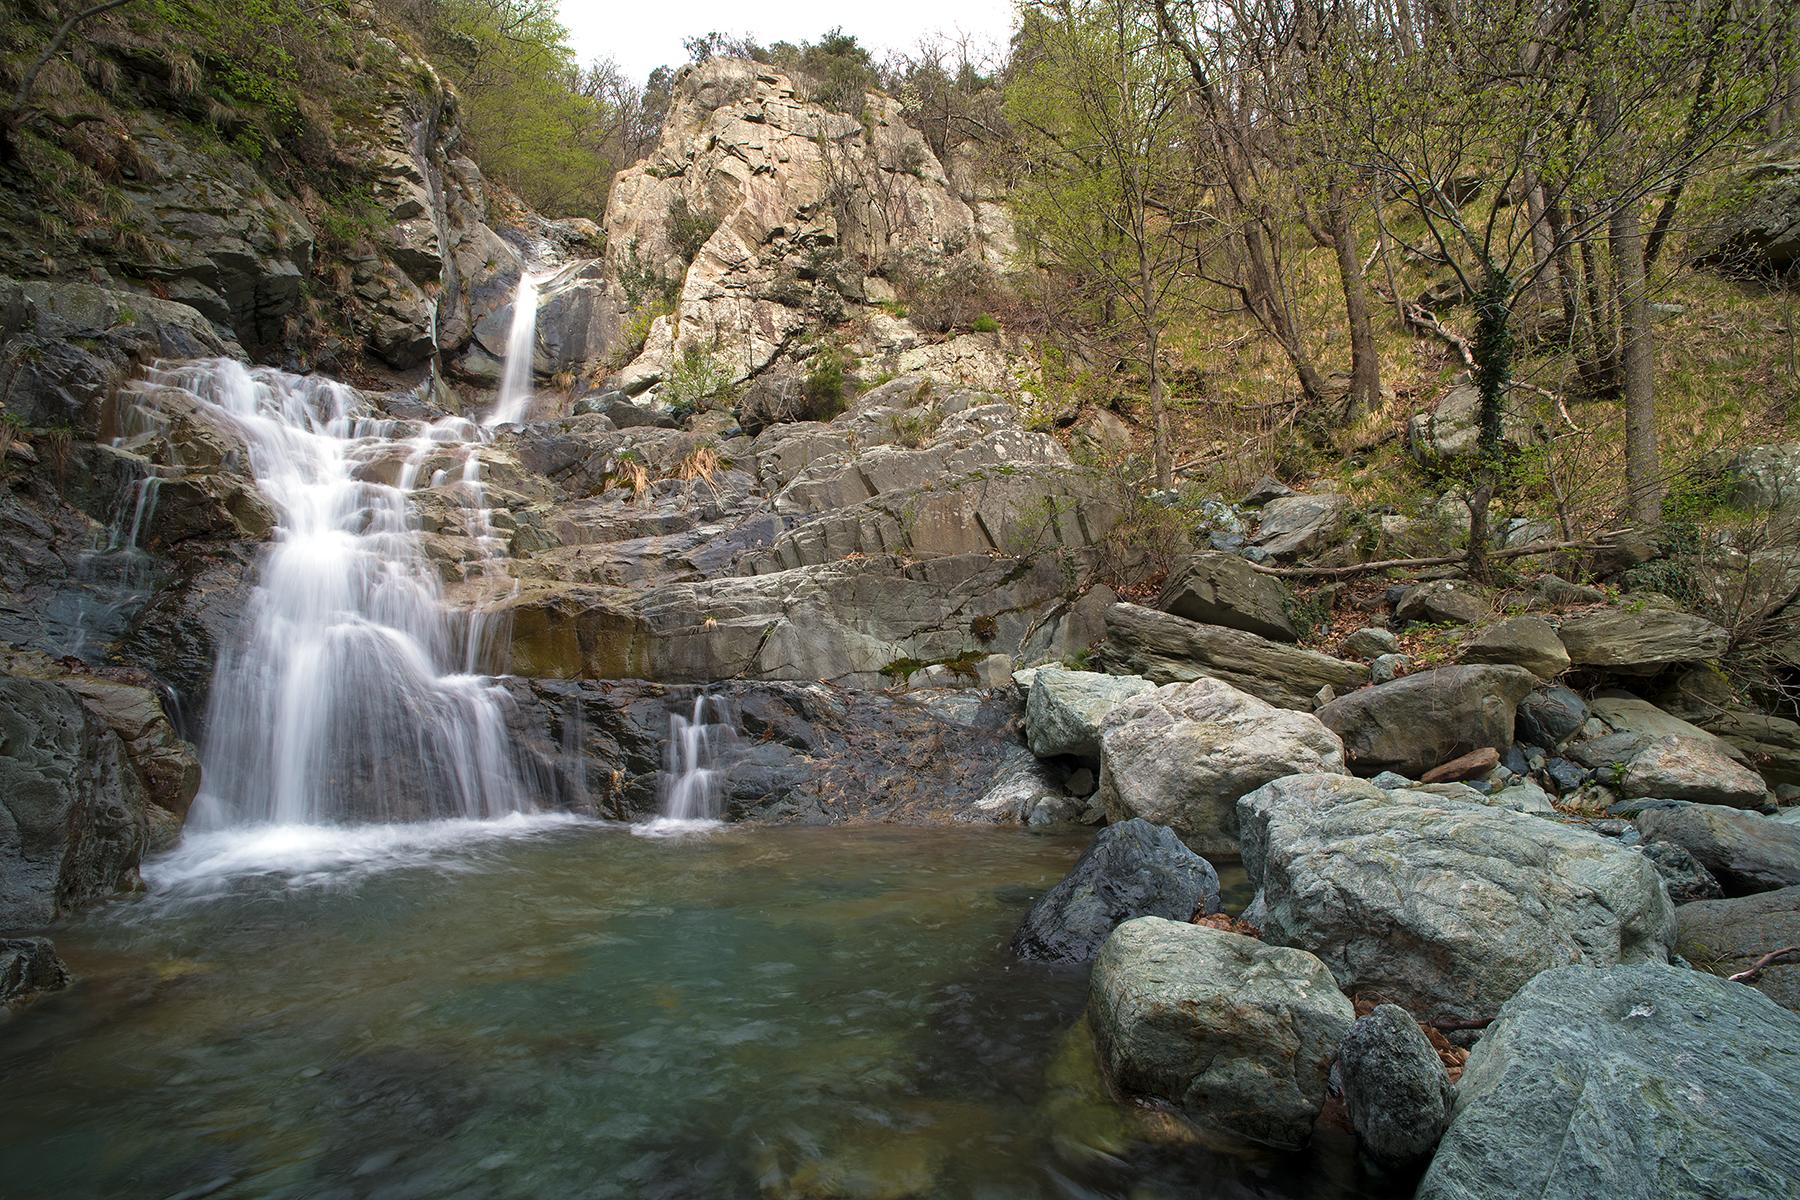 Trekking fotografico – Le cascate del Rio Gandolfi